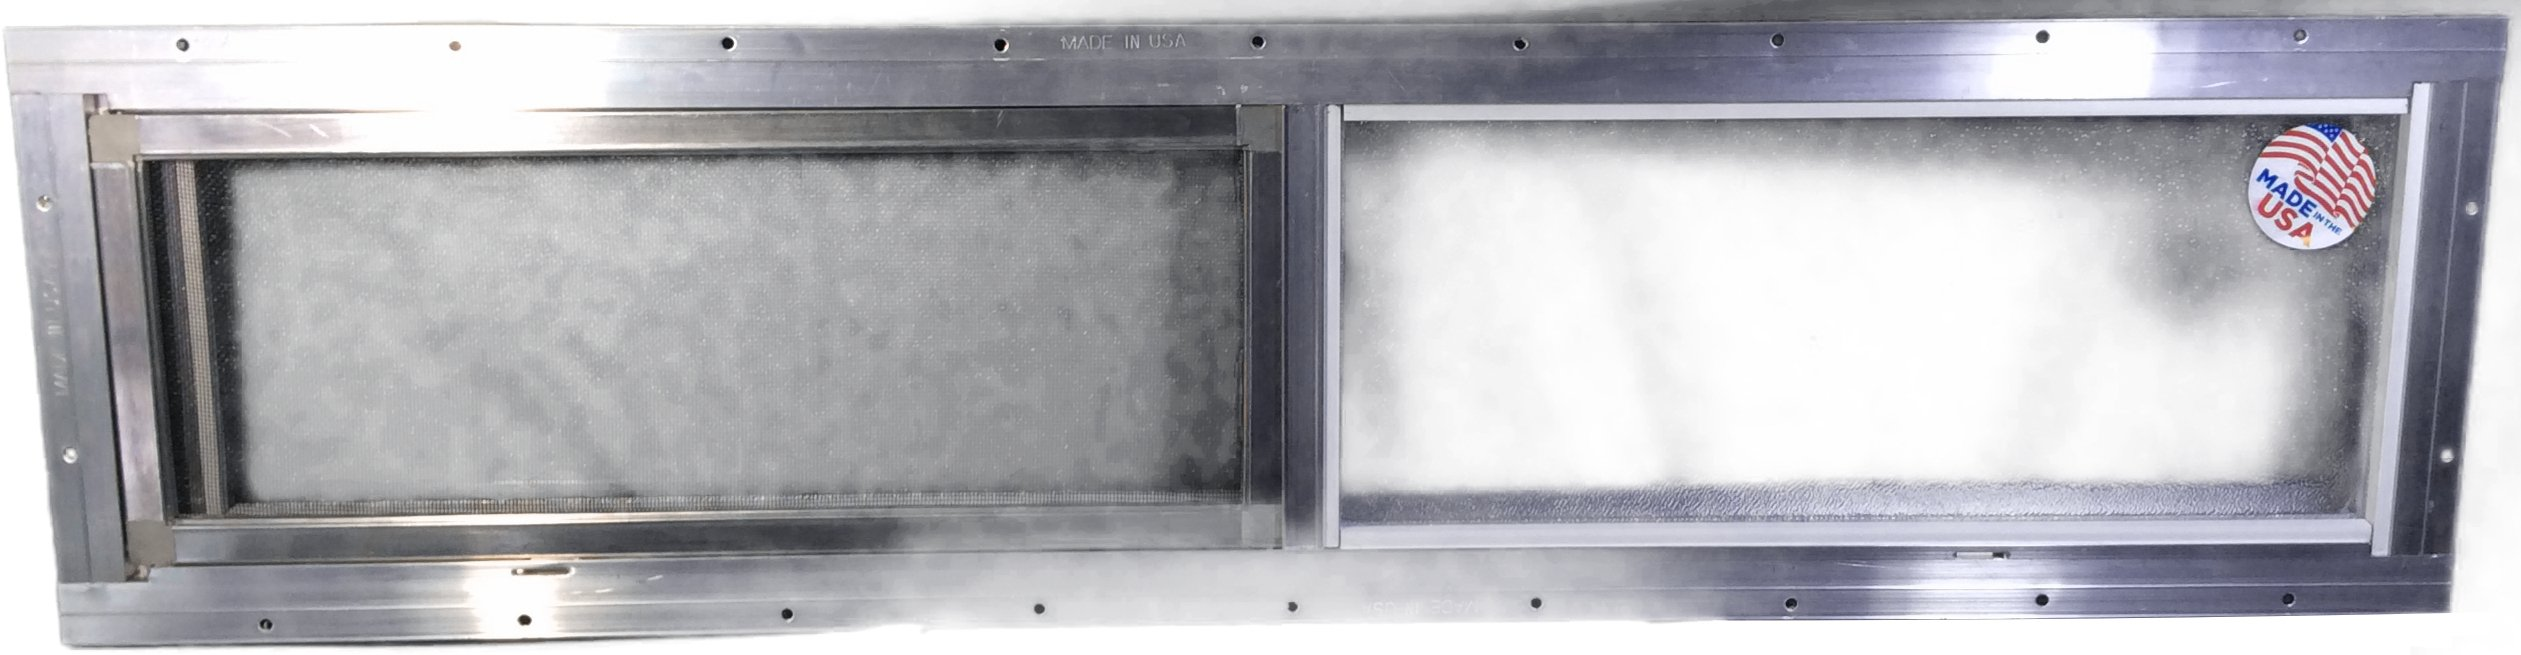 Mobile Home Window 36'' X 8'' Horizontal Slider. Obscured Glass Bathroom Window by Kinro